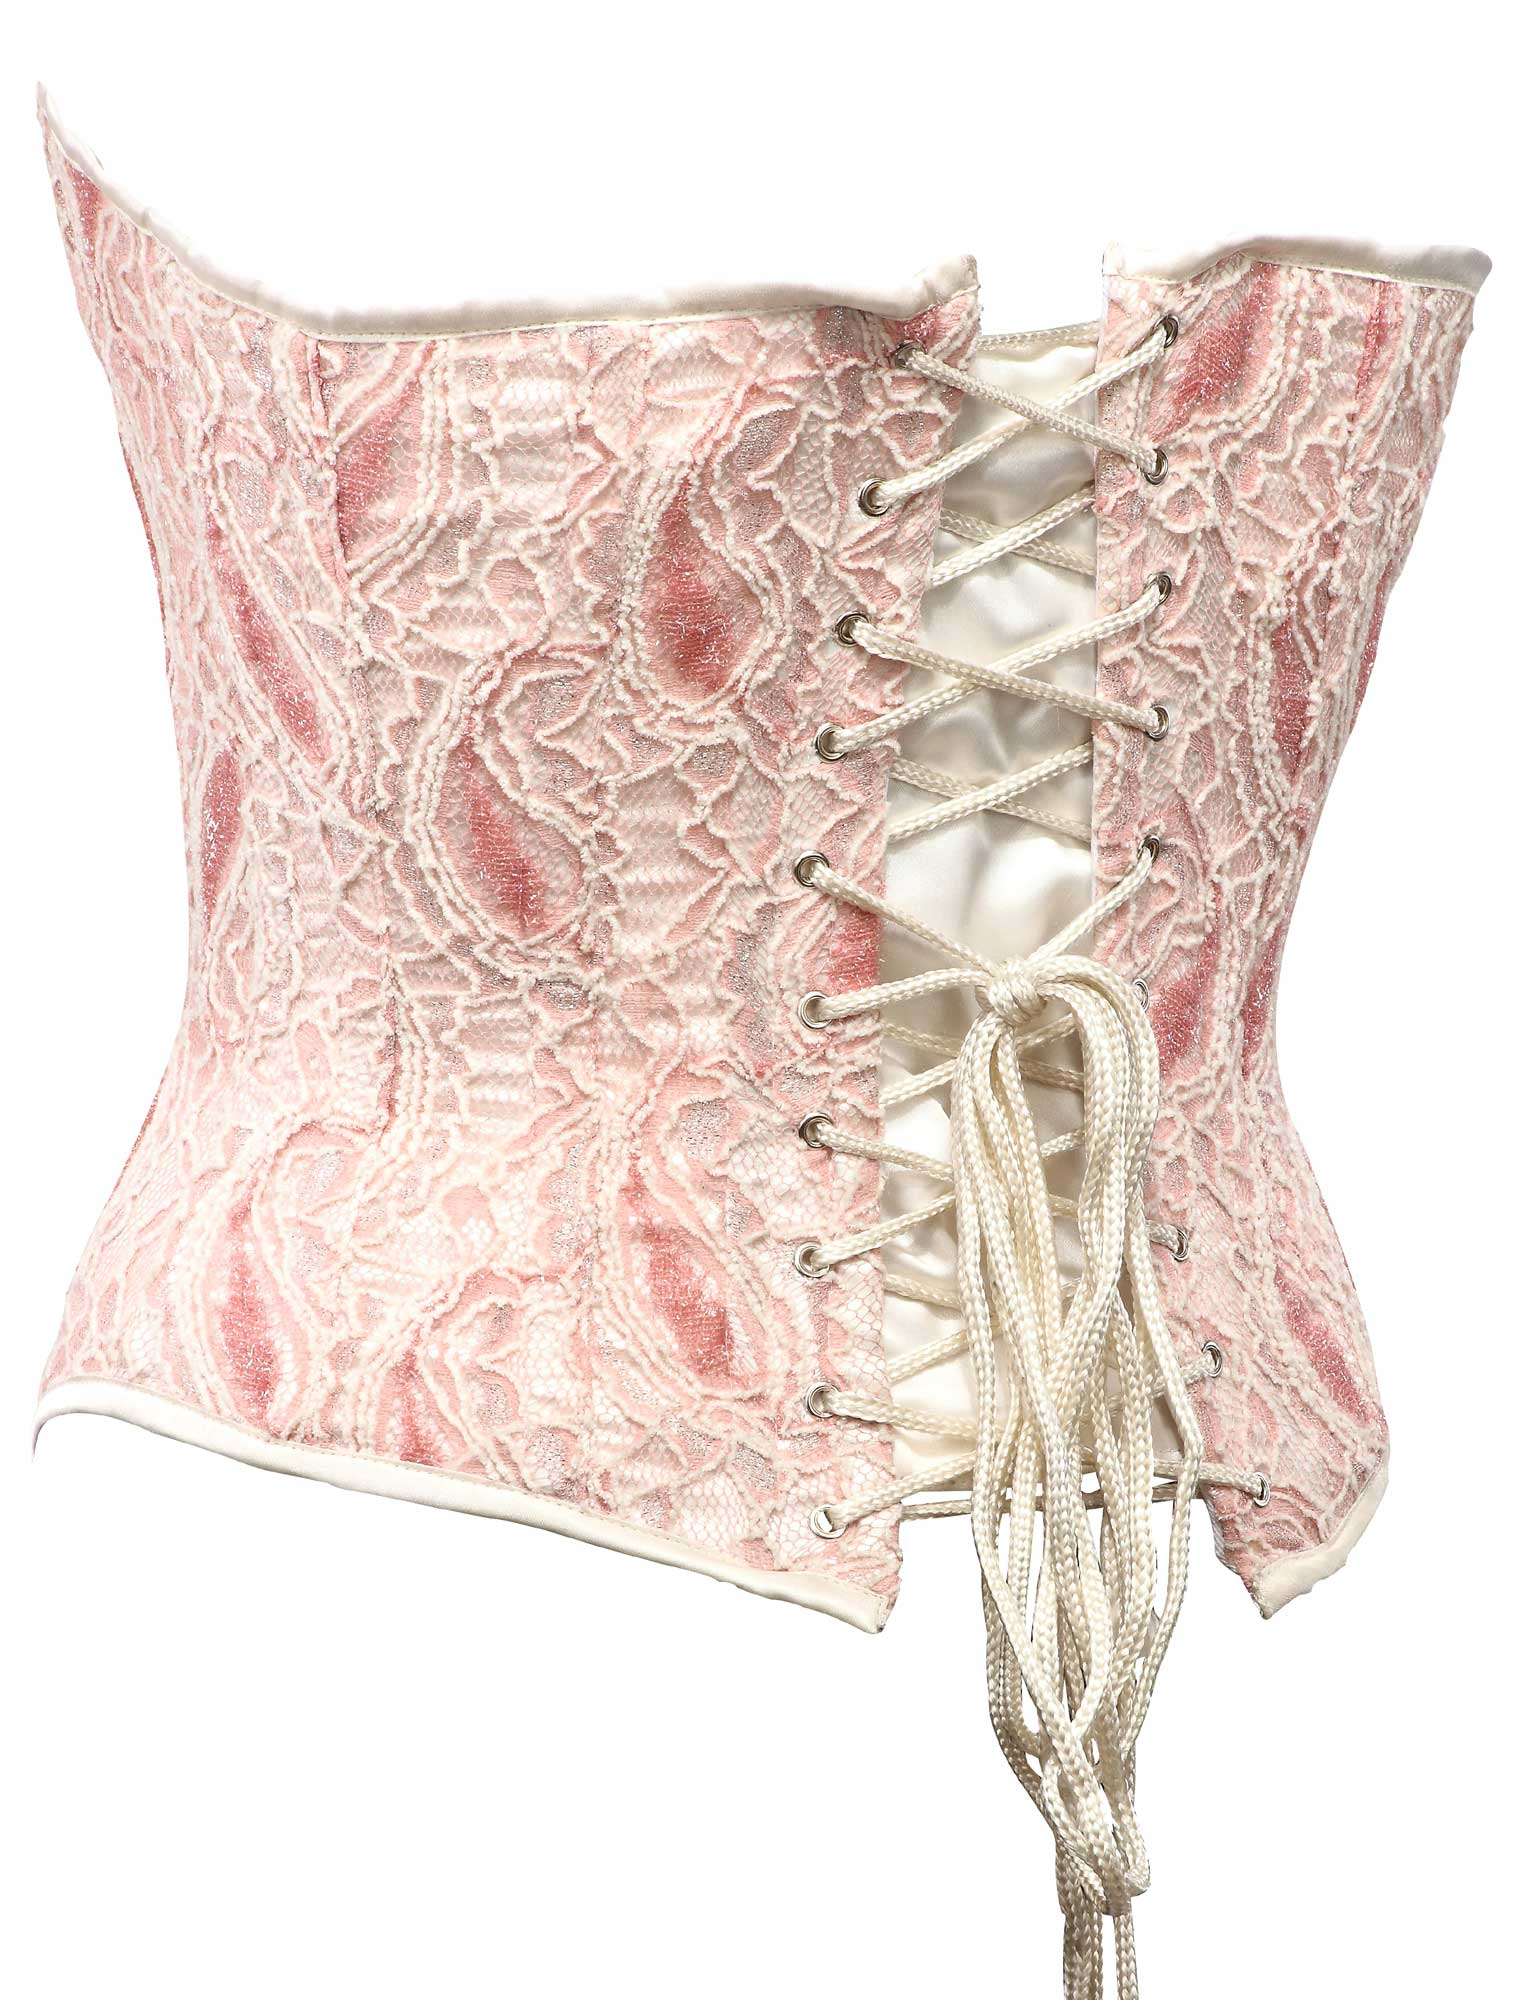 paisley_crochet_steel_boning_corset_waist_cincher_bustier_bustiers_and_corsets_3.jpg